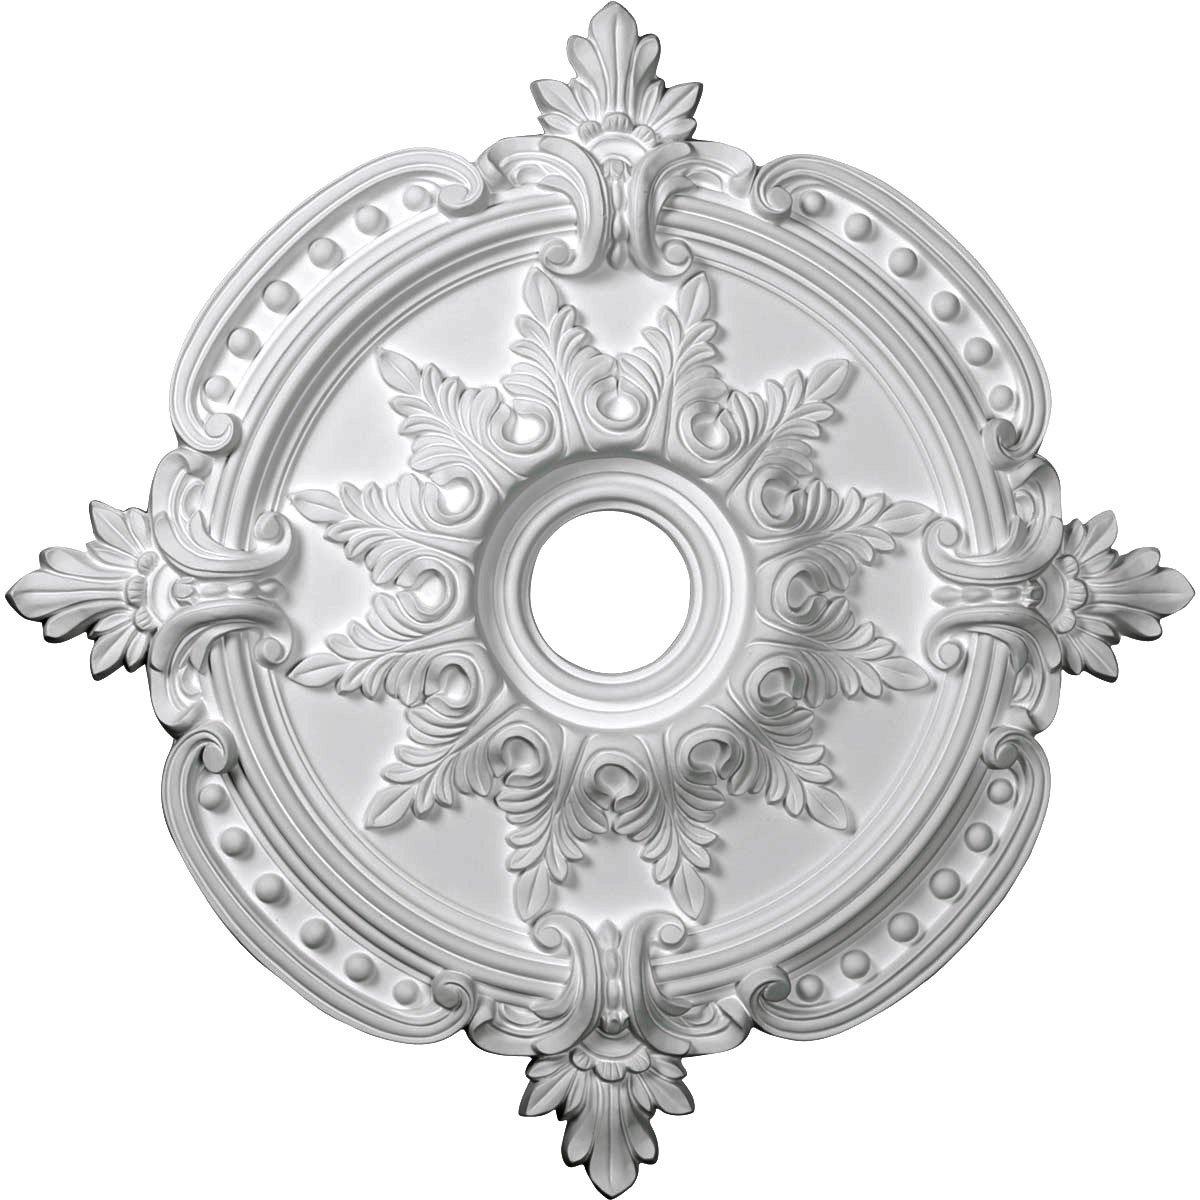 Ekena Millwork CM28BE 28 3/8-Inch OD x 4 1/2-Inch ID x 1 5/8-Inch P Benson Classic Ceiling Medallion